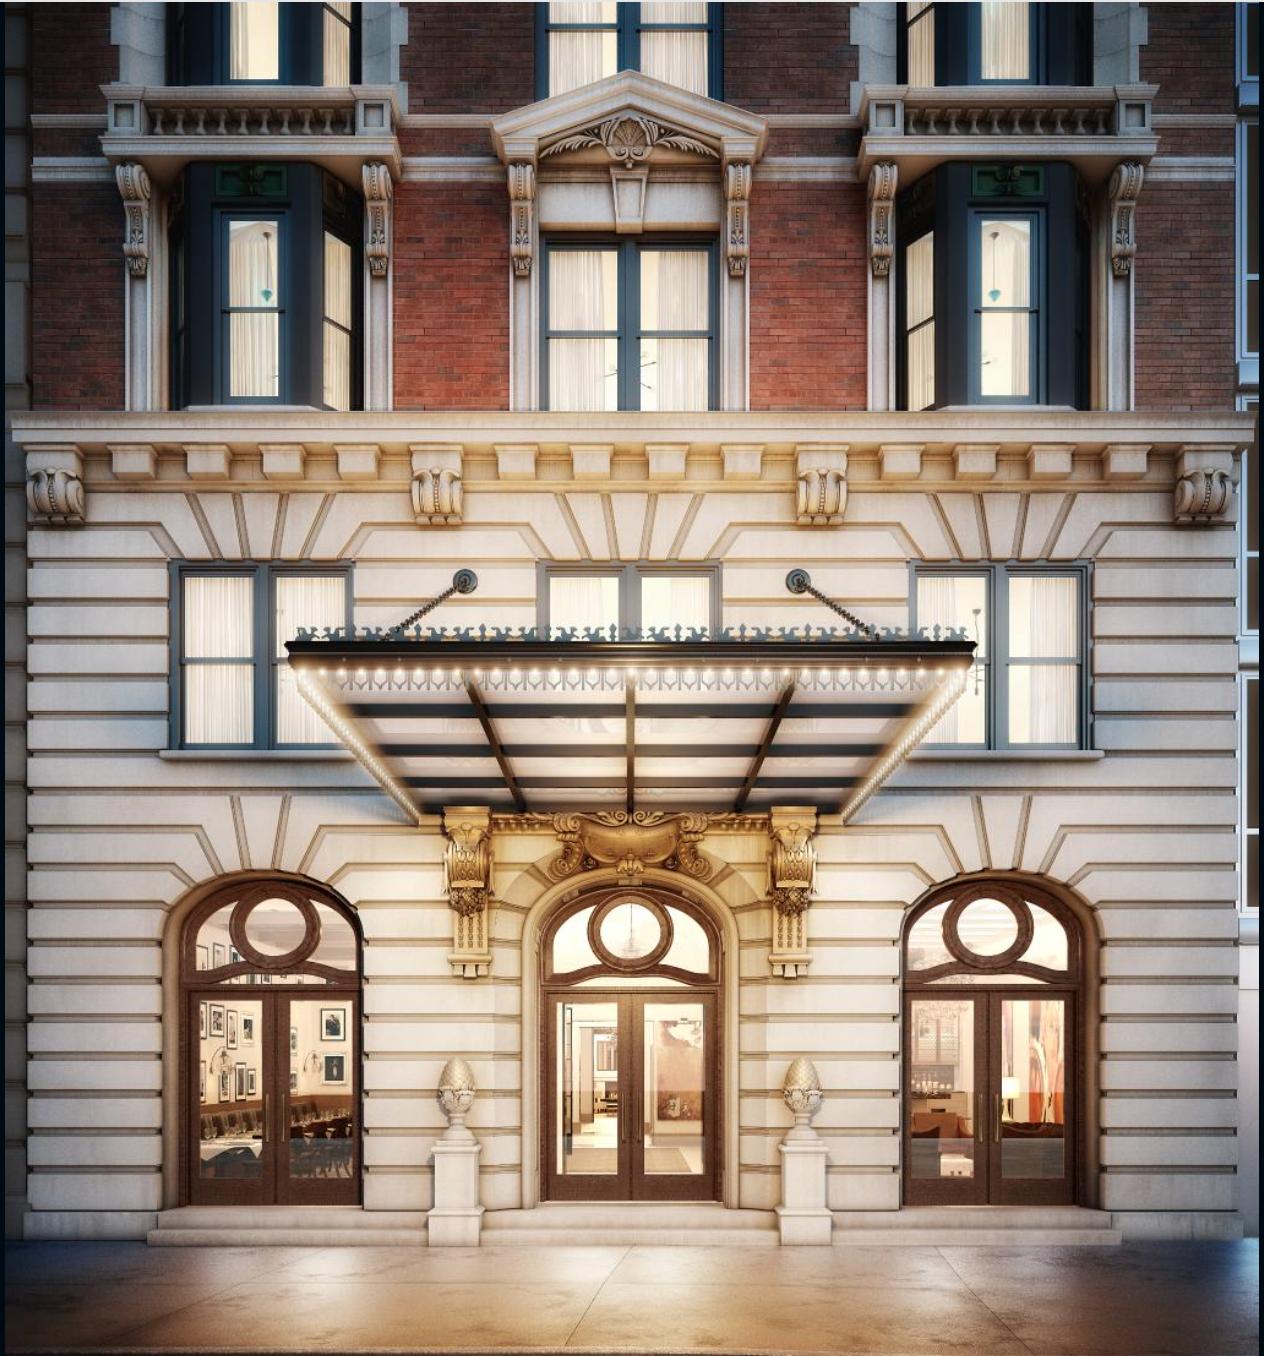 https://www.hotelsbyday.com/_data/default-hotel_image/4/22691/screen-shot-2020-10-28-at-11-43-05-pm.png